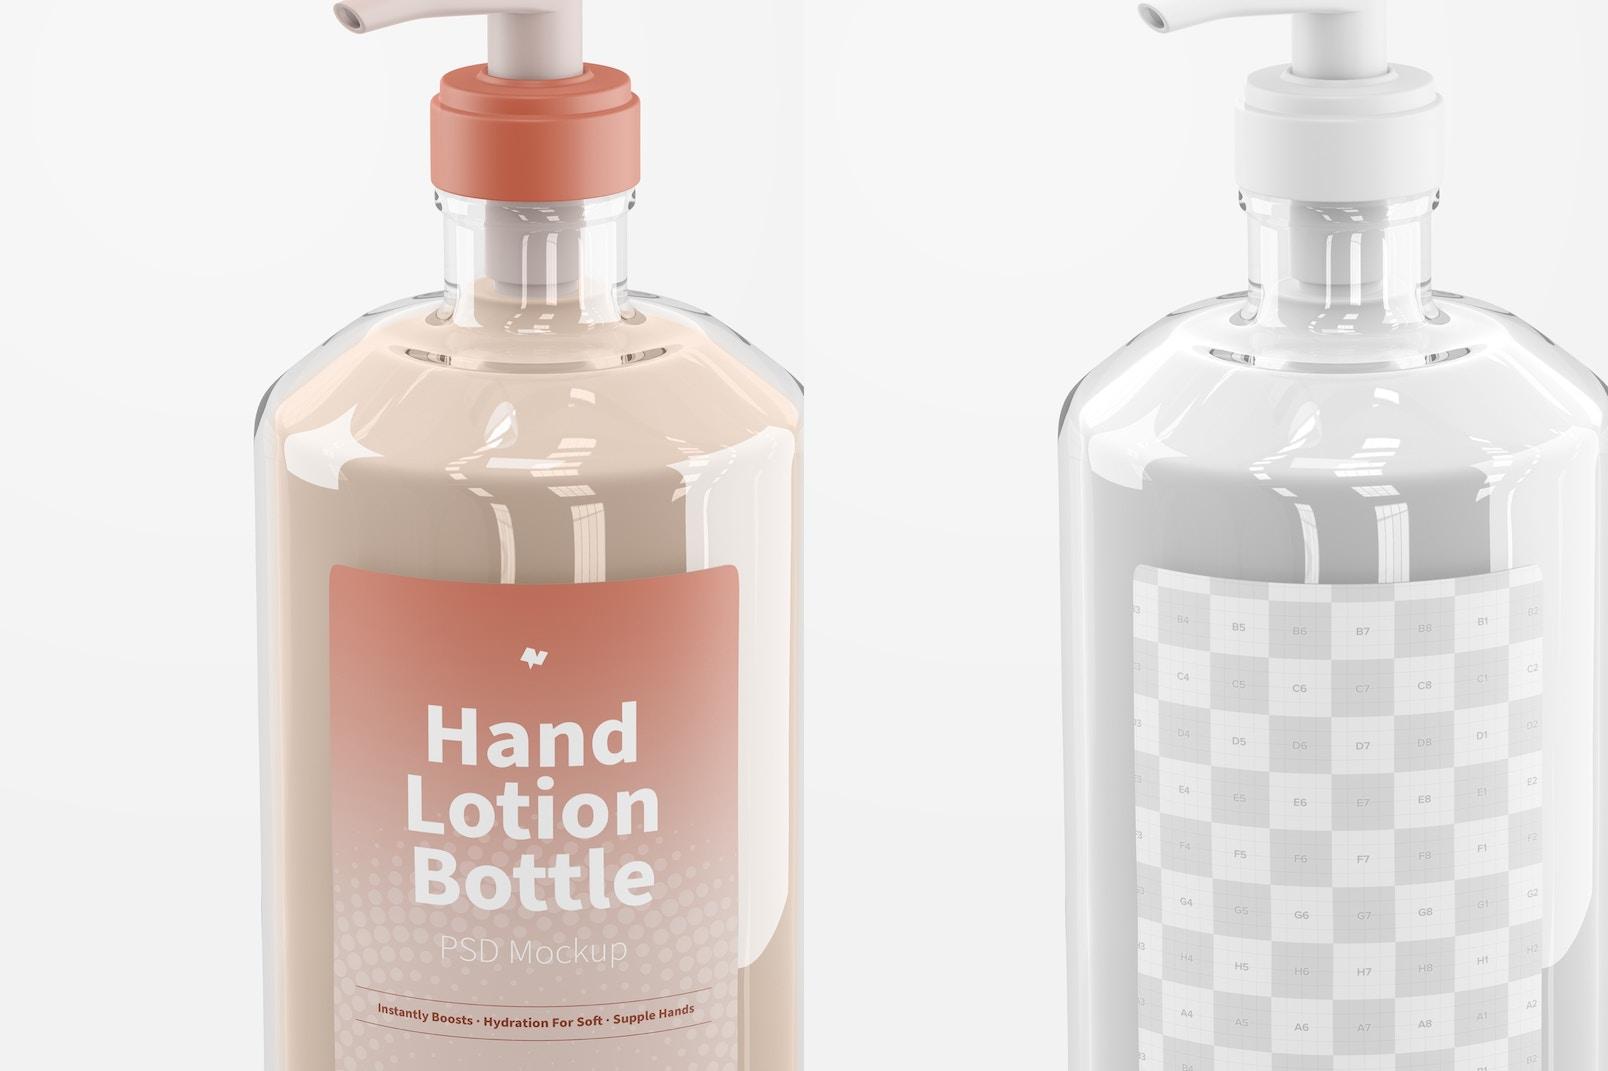 500 ml Hand Lotion Bottle Mockup, Close Up